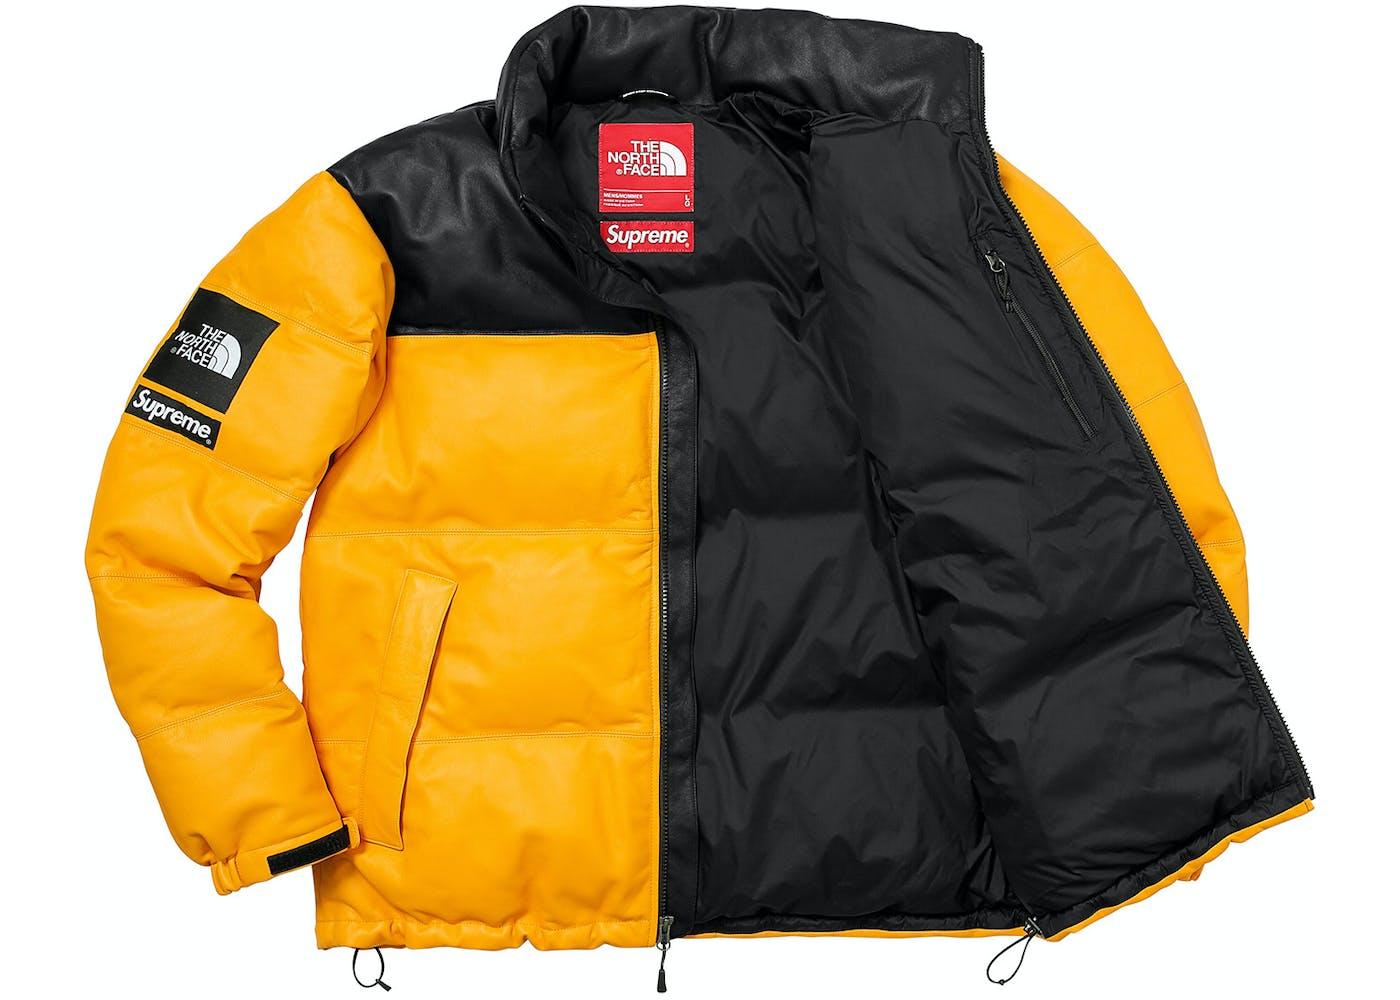 ... Supreme The North Face Leather Nuptse Jacket Yellow ... ca1870e05